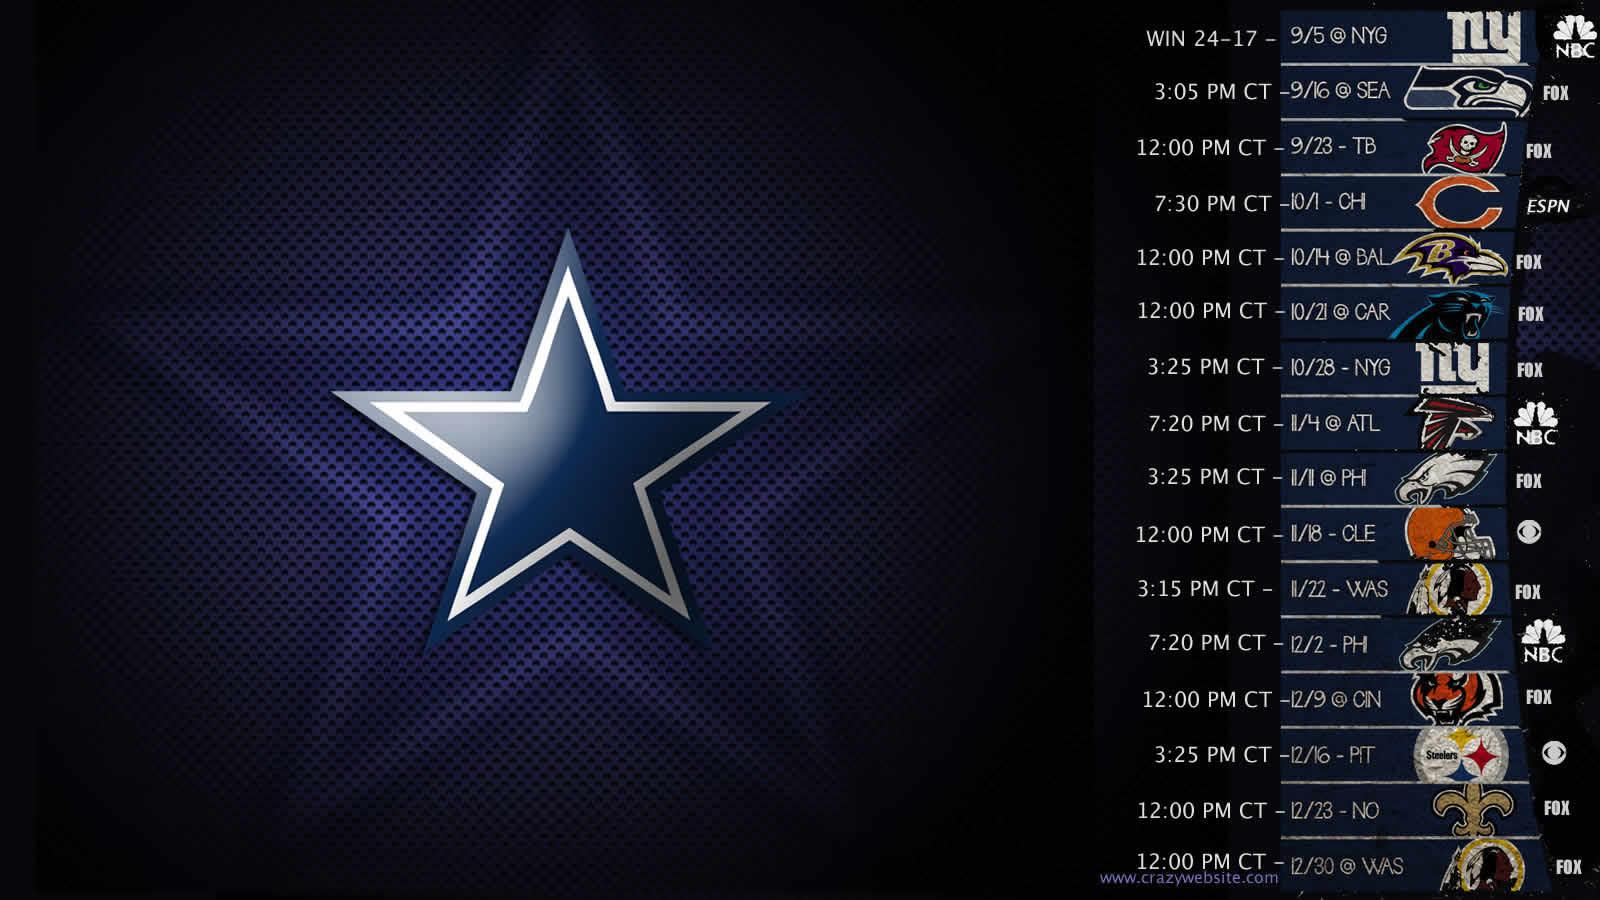 Dallas Cowboys Wallpaper For Android Source IPhone WallpaperSafari